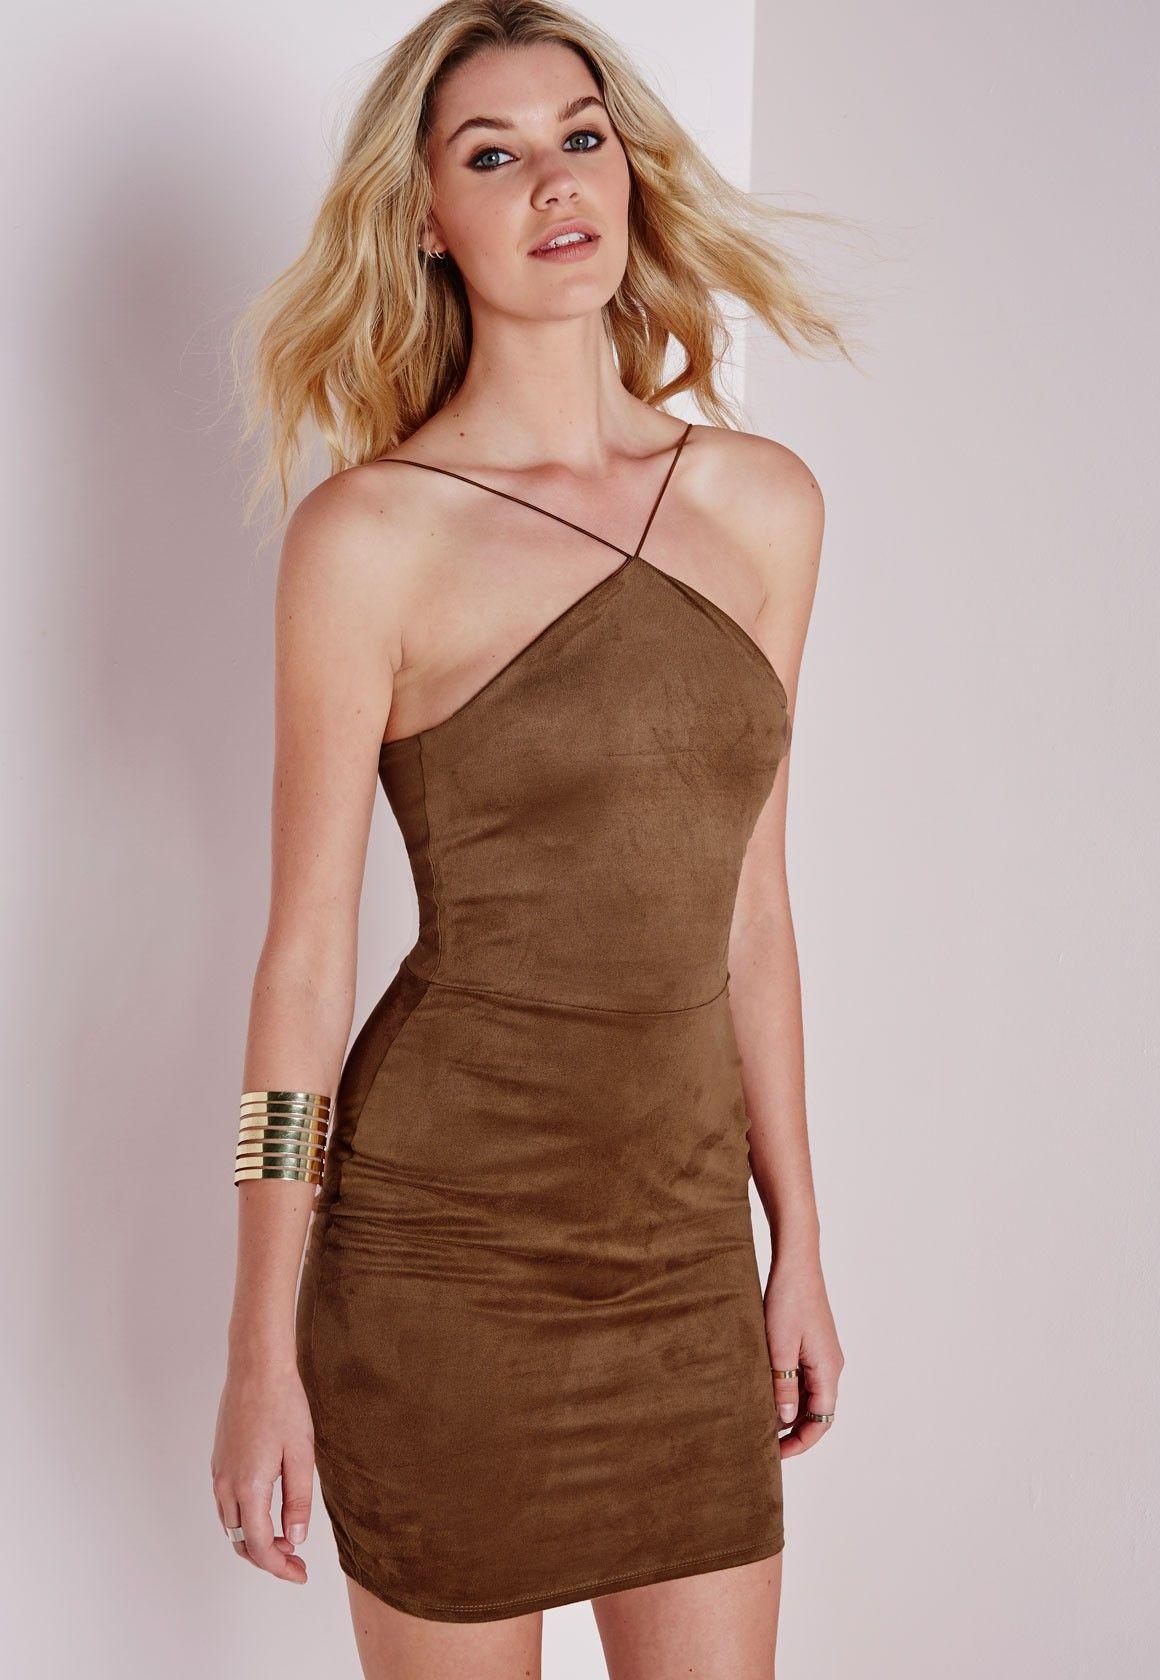 Missguided Faux Suede Halter Bodycon Dress Tan Bodycon Dress Women Dress Online Brown Halter Dress [ 1680 x 1160 Pixel ]